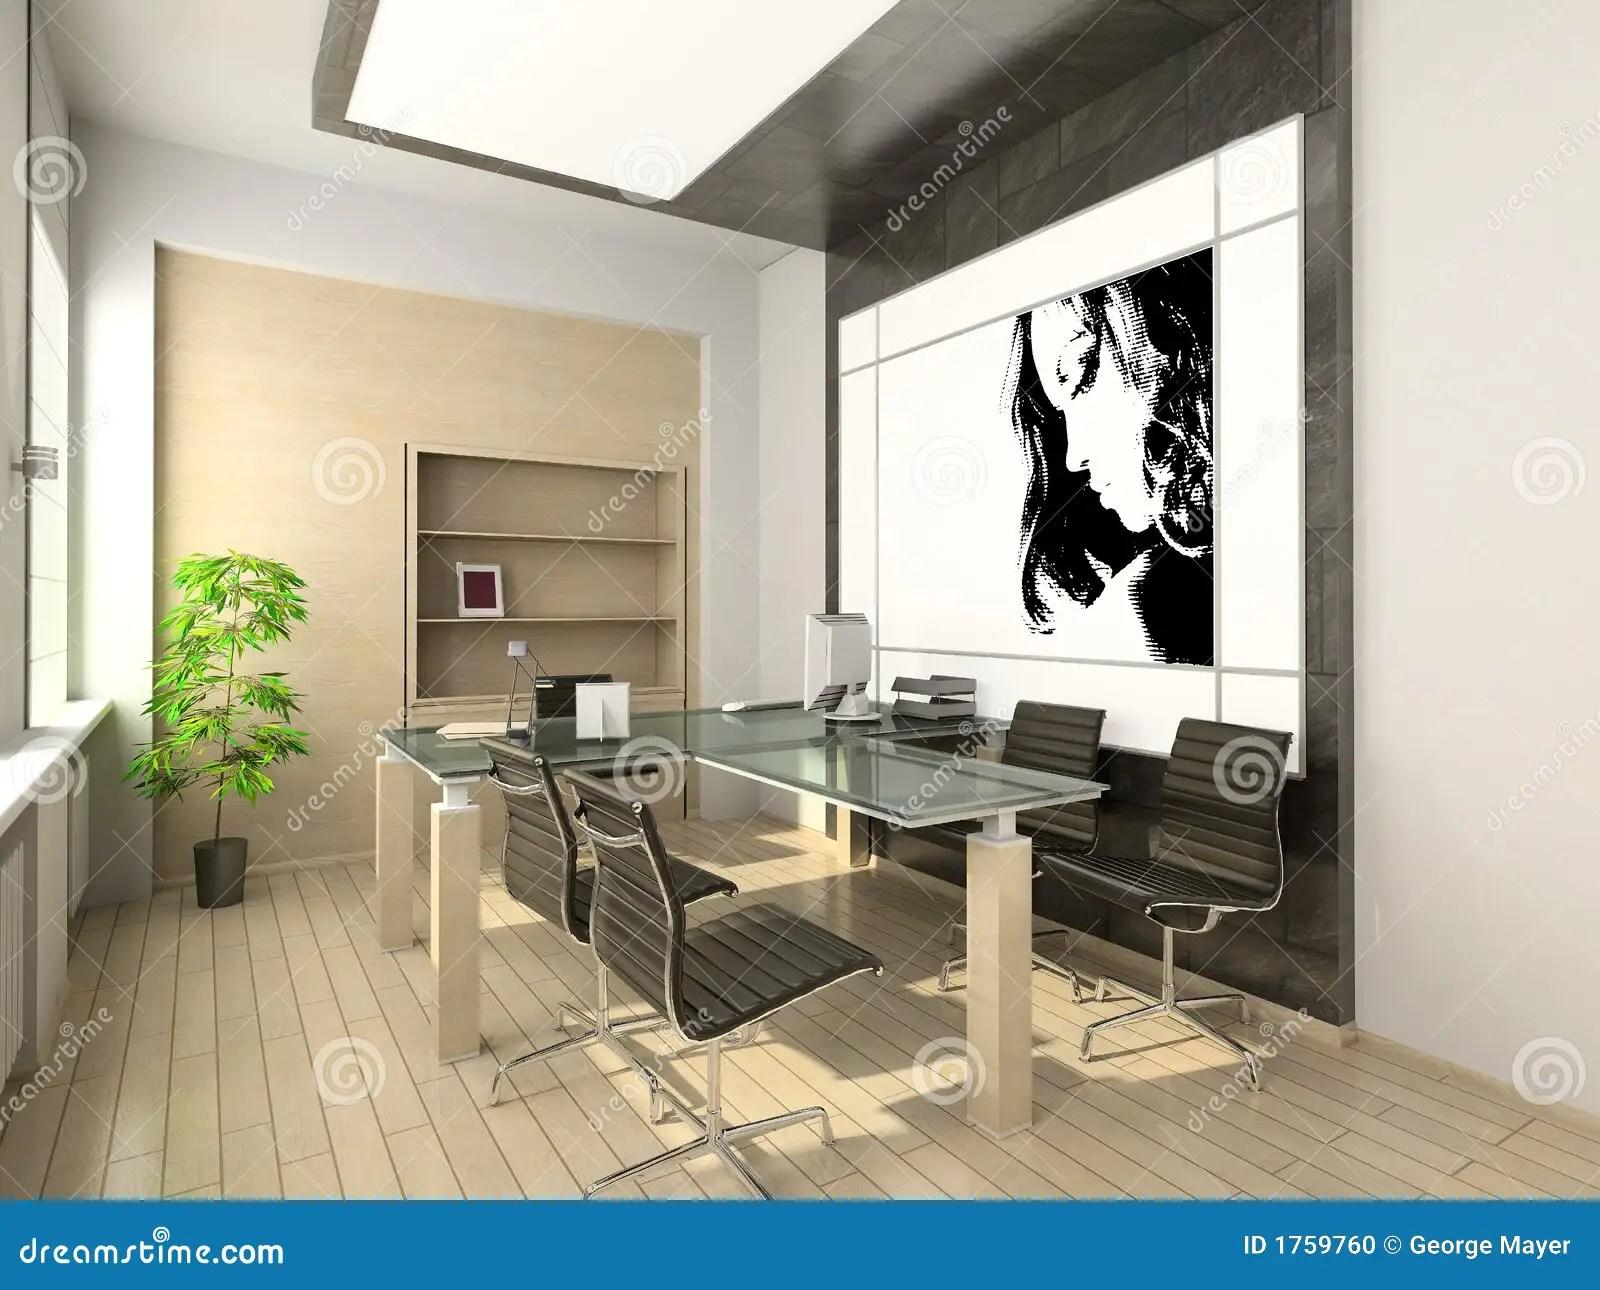 Design Of Modern Office Hitech Interior Stock